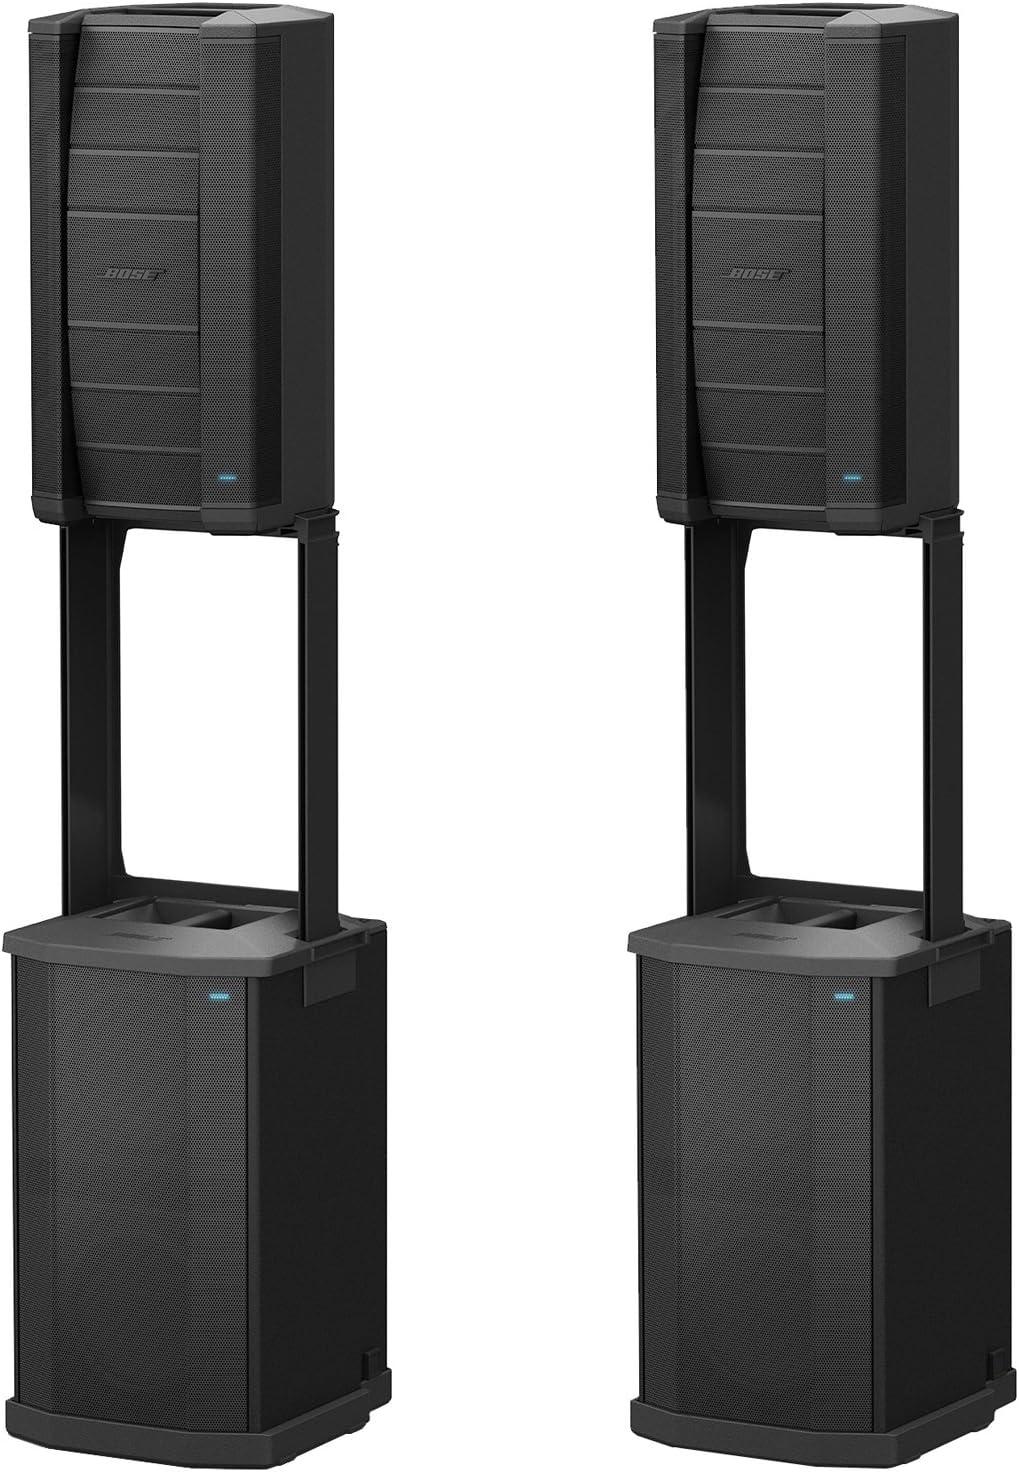 Bose F1 Model 812   Flexible Array Dual System Loudspeaker and Subwoofer